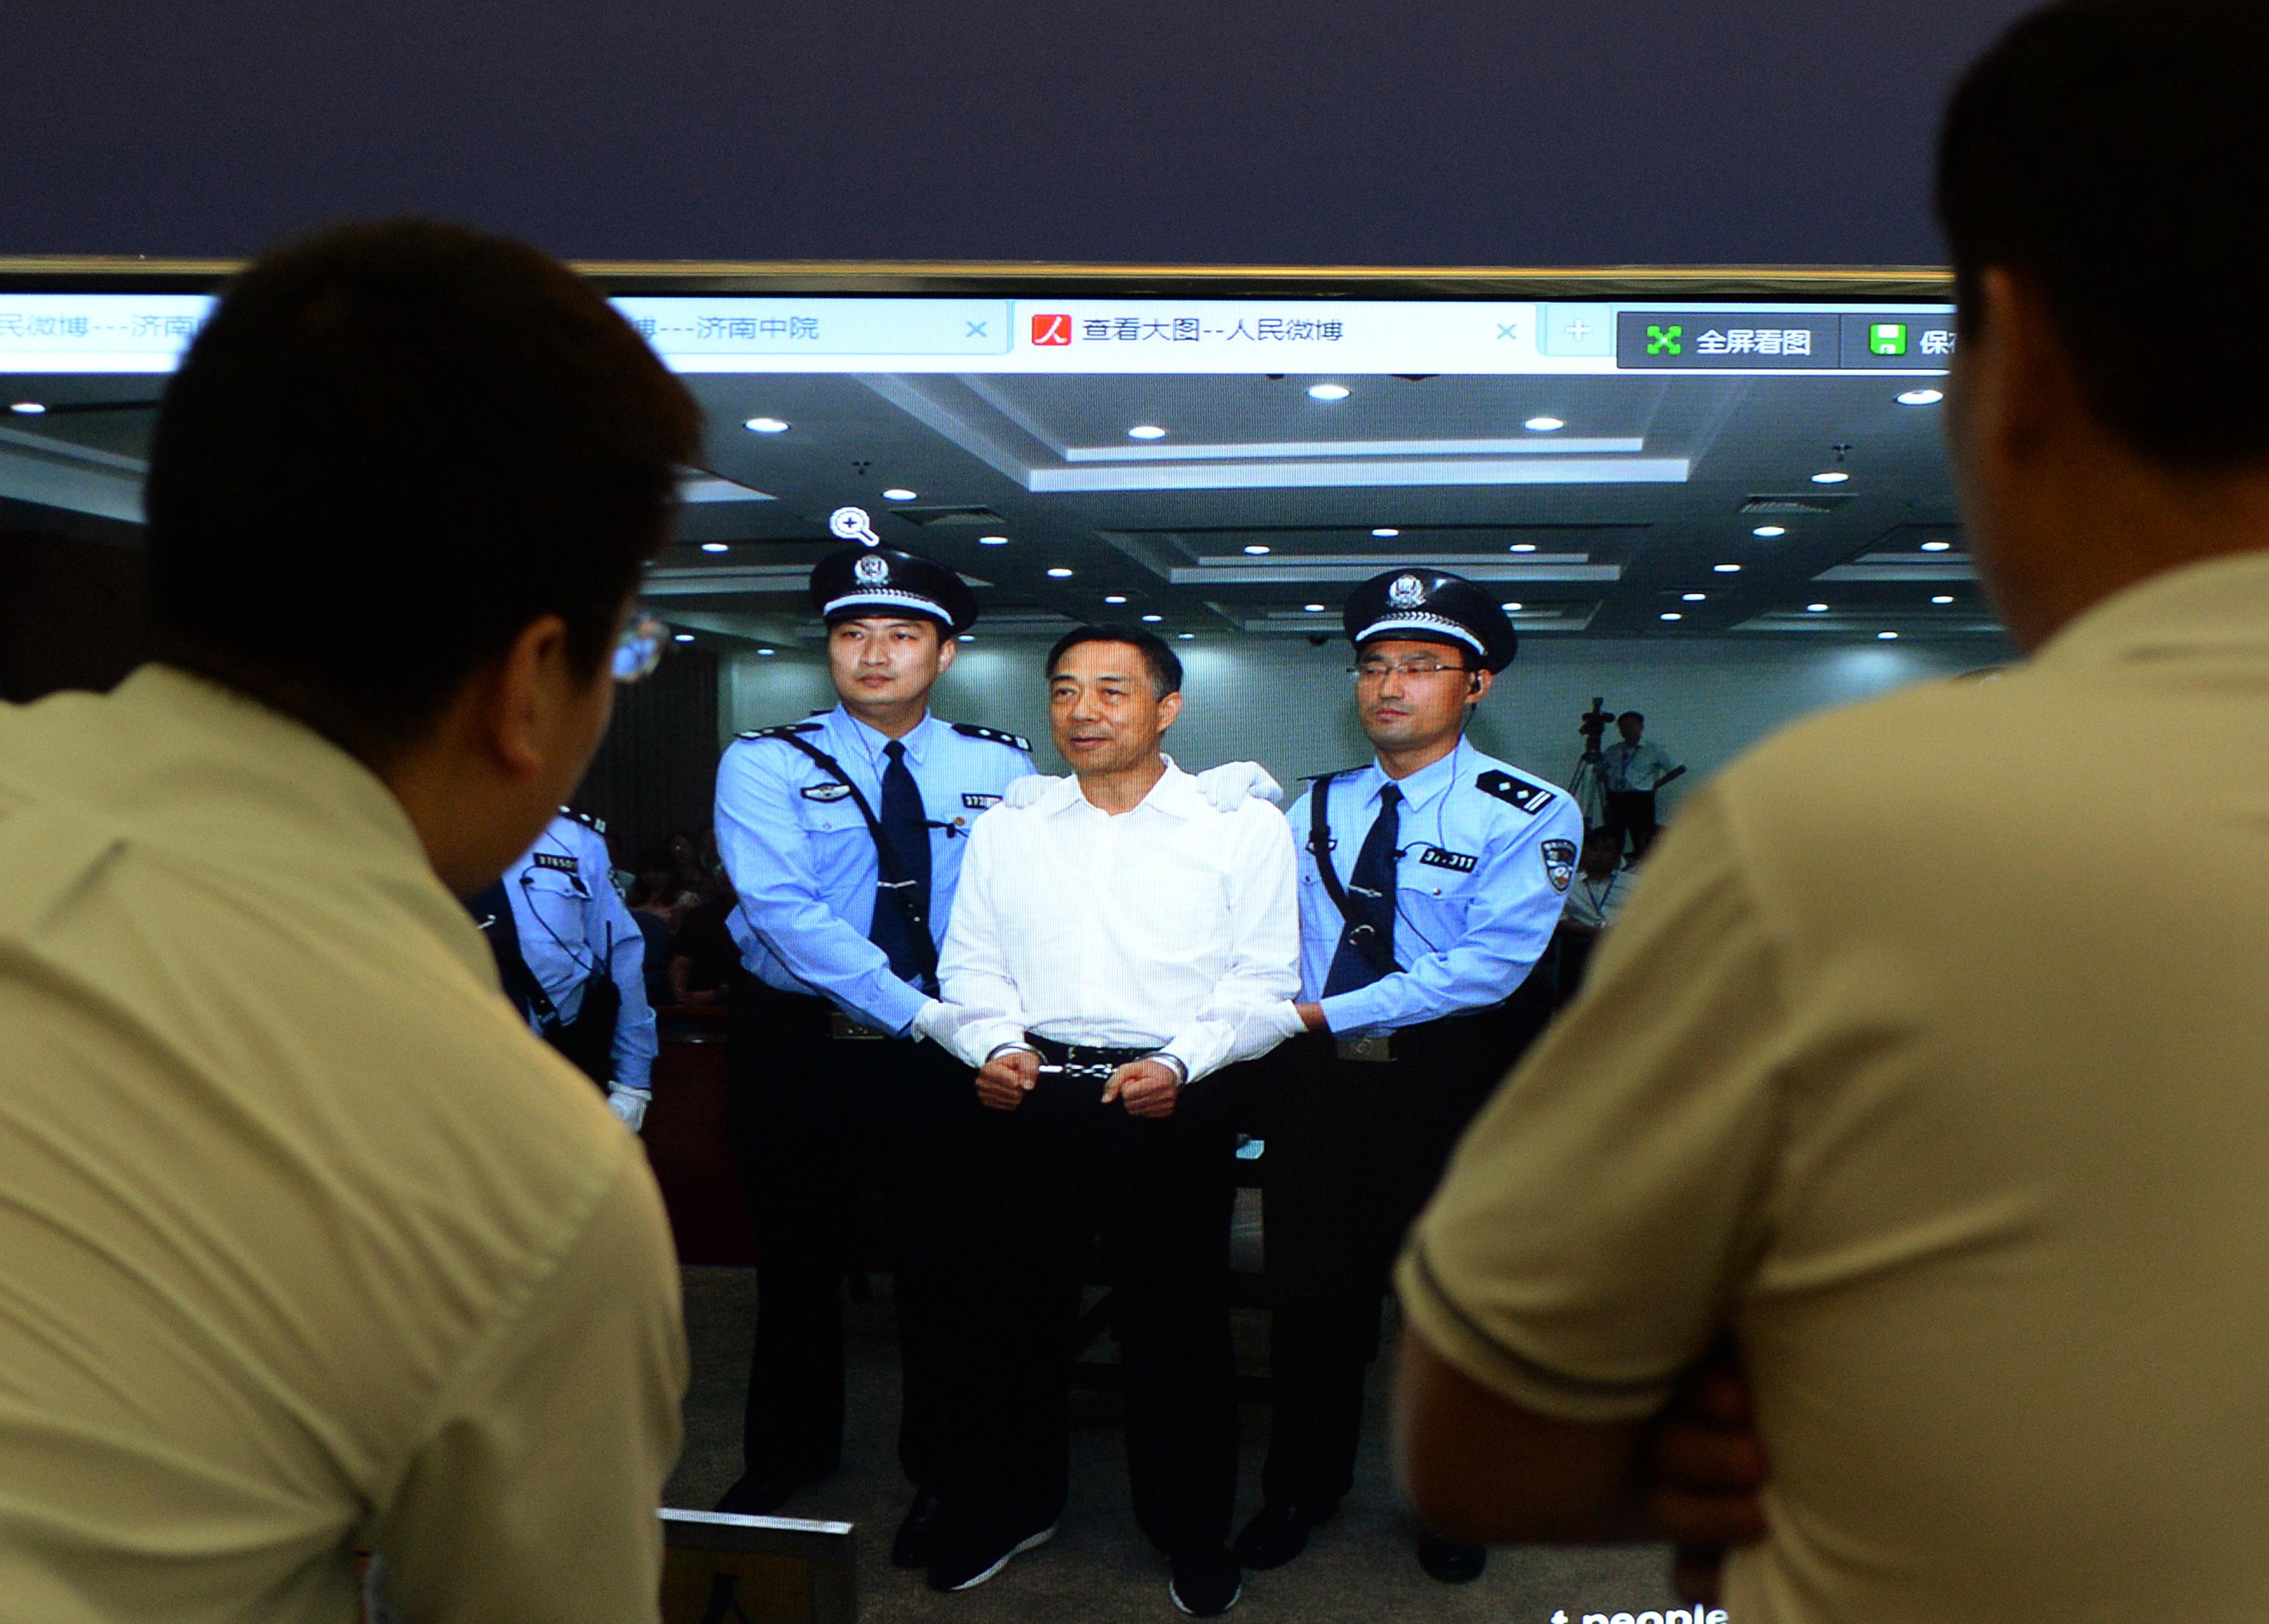 薄熙来元書記の支持者が政党結成-中国共産党に憲法順守要求 - Bloomberg